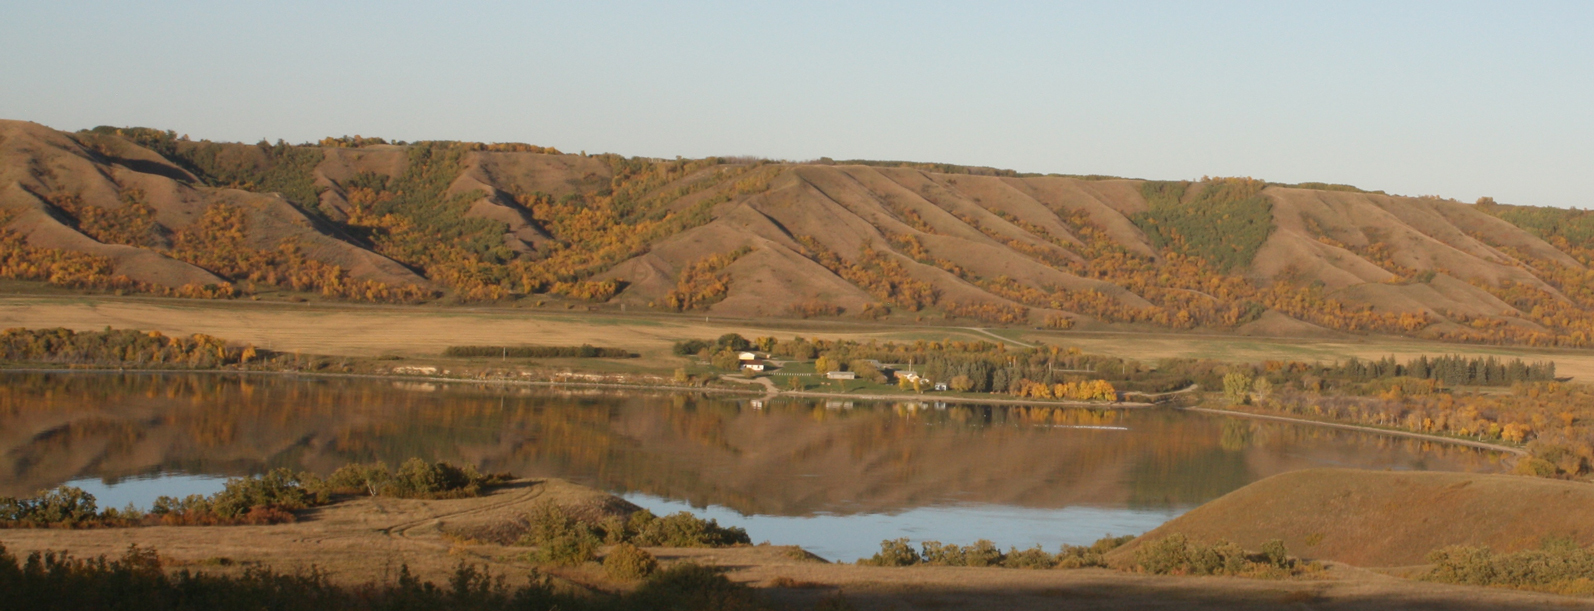 Round Lake-Camp McKay